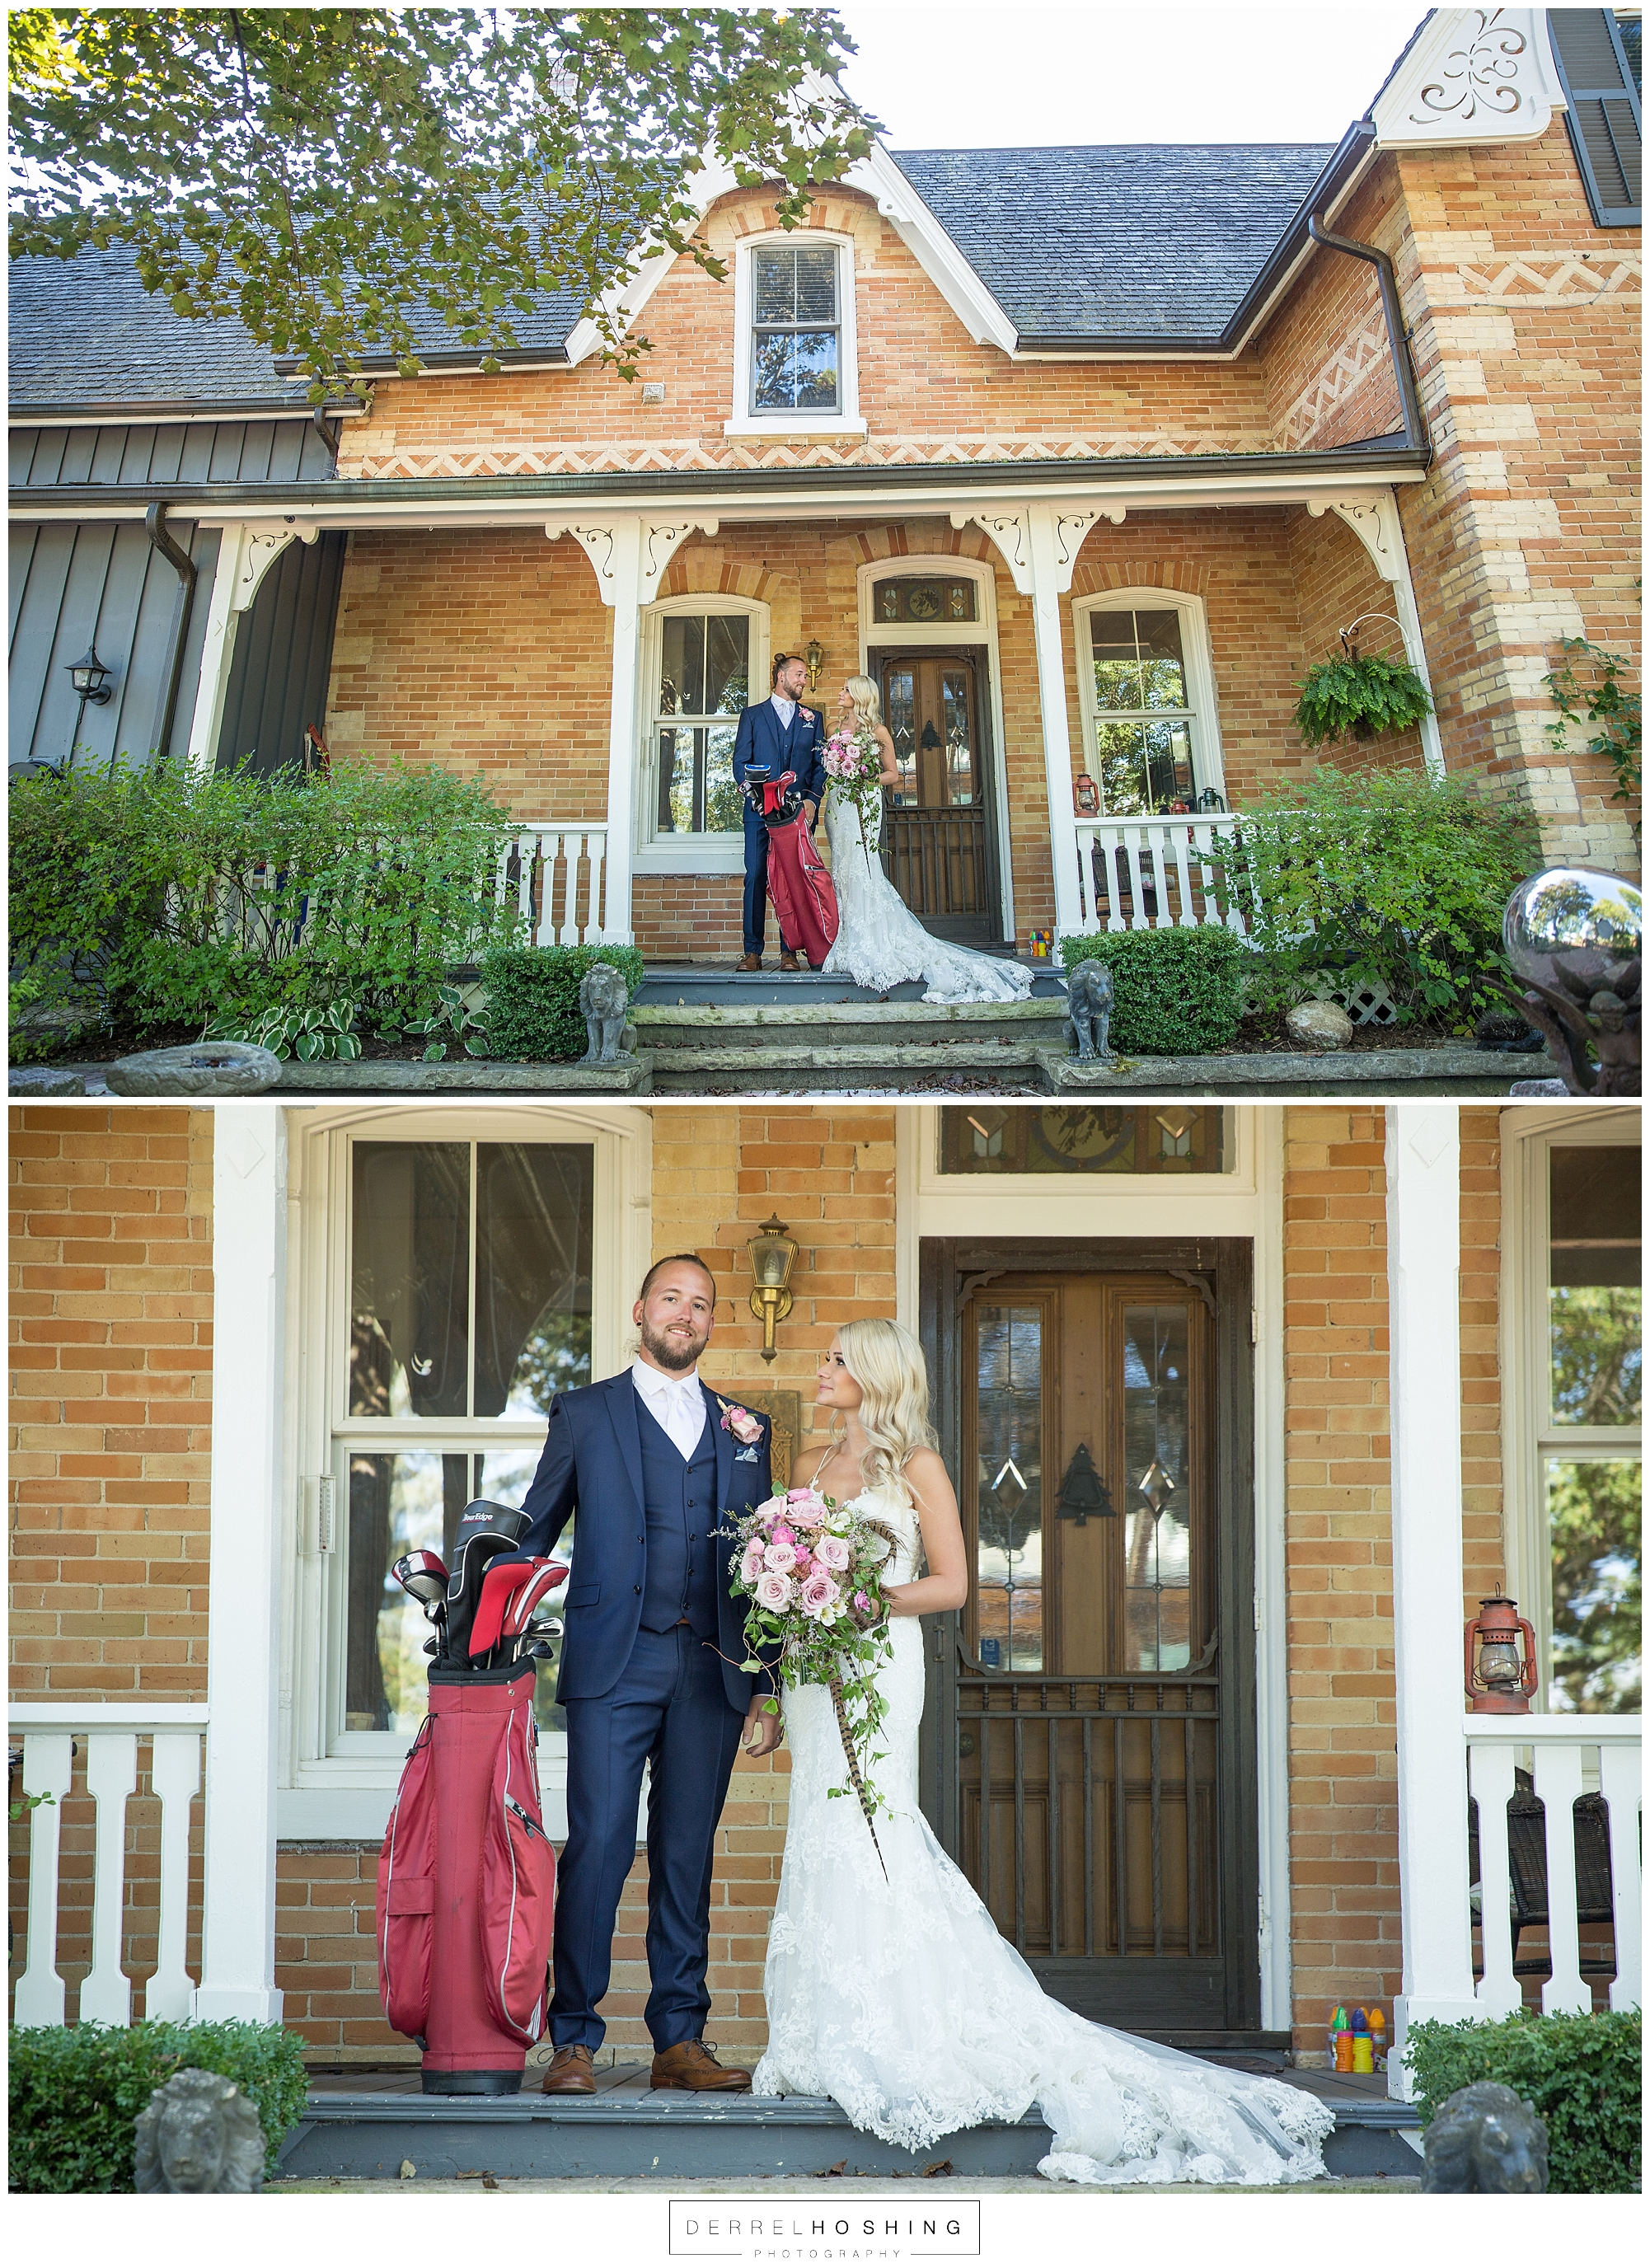 Belcroft-Estates-&-Event-Centre-Wedding-Innisfil-Ontario-0016.jpg